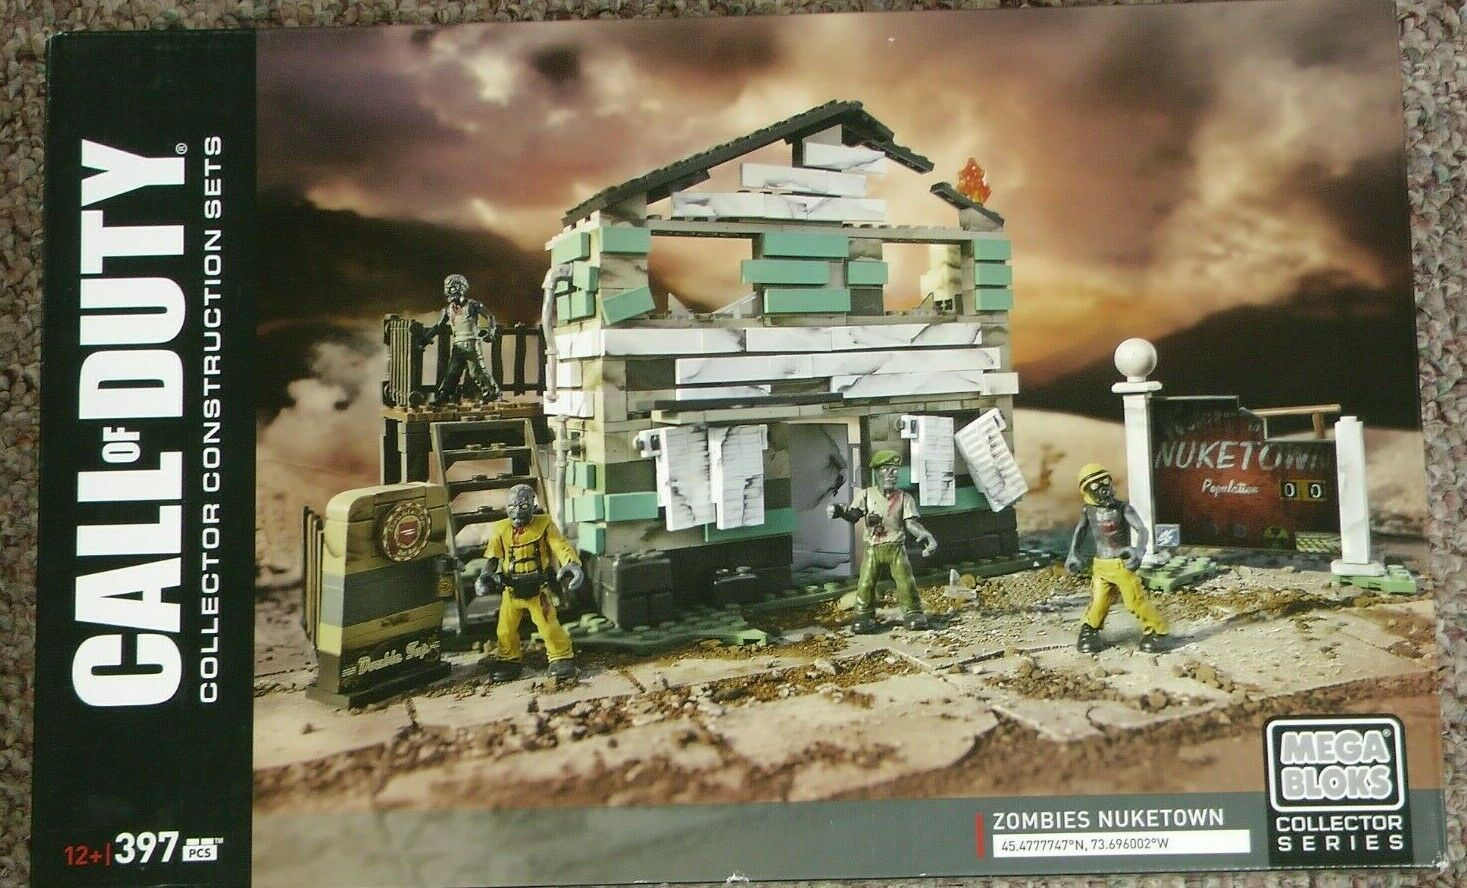 Mega Bloks Call Of Duty Zombies Nuketown For Sale Online